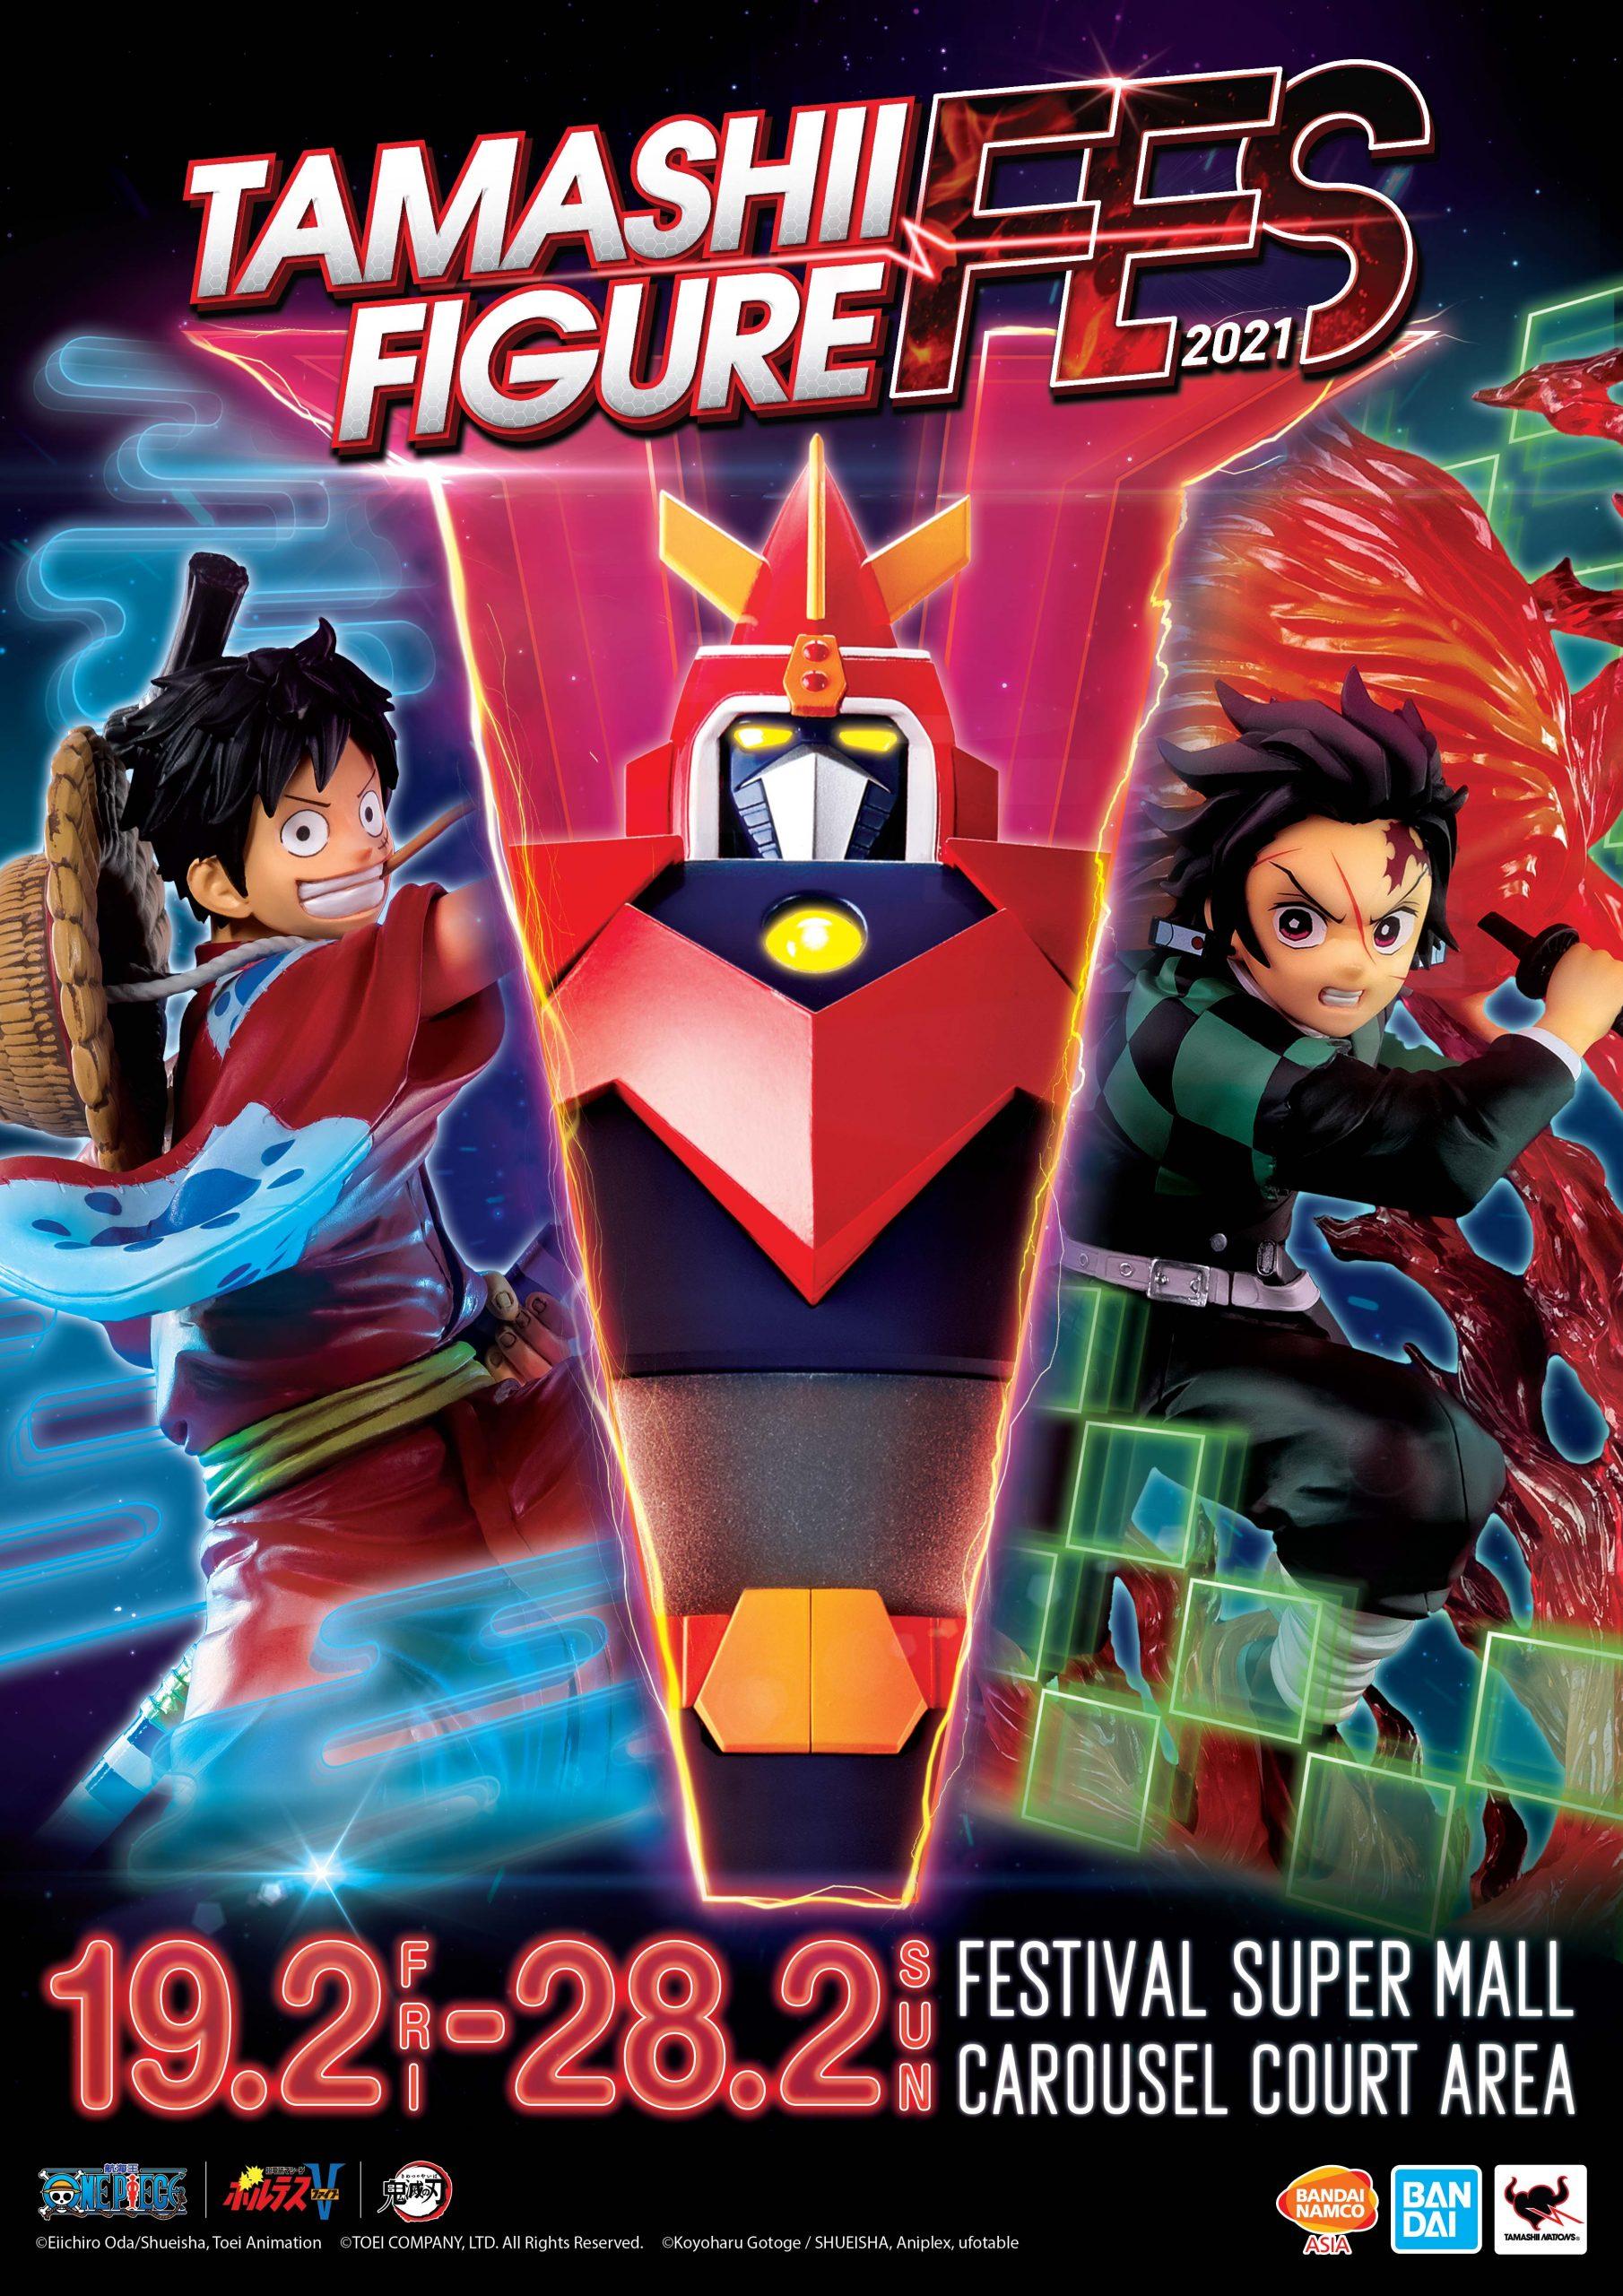 Tamashii Figure FES 2021 Poster